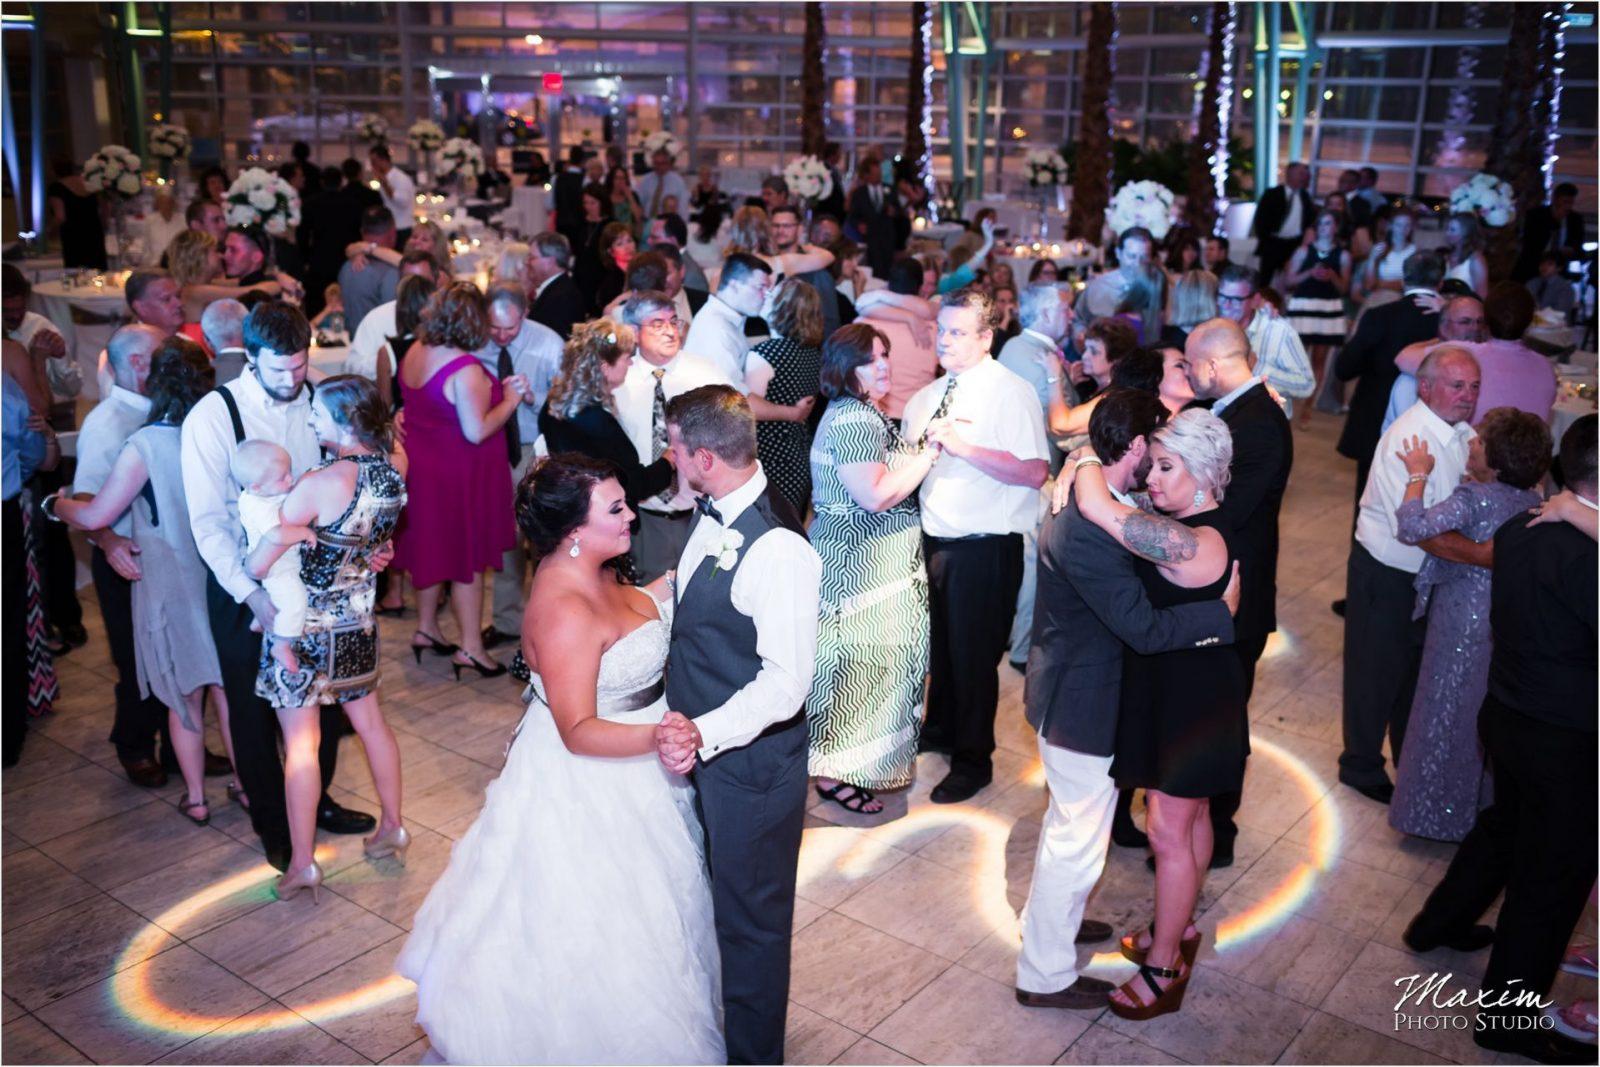 Group Photo Schuster Center Wedding reception dance